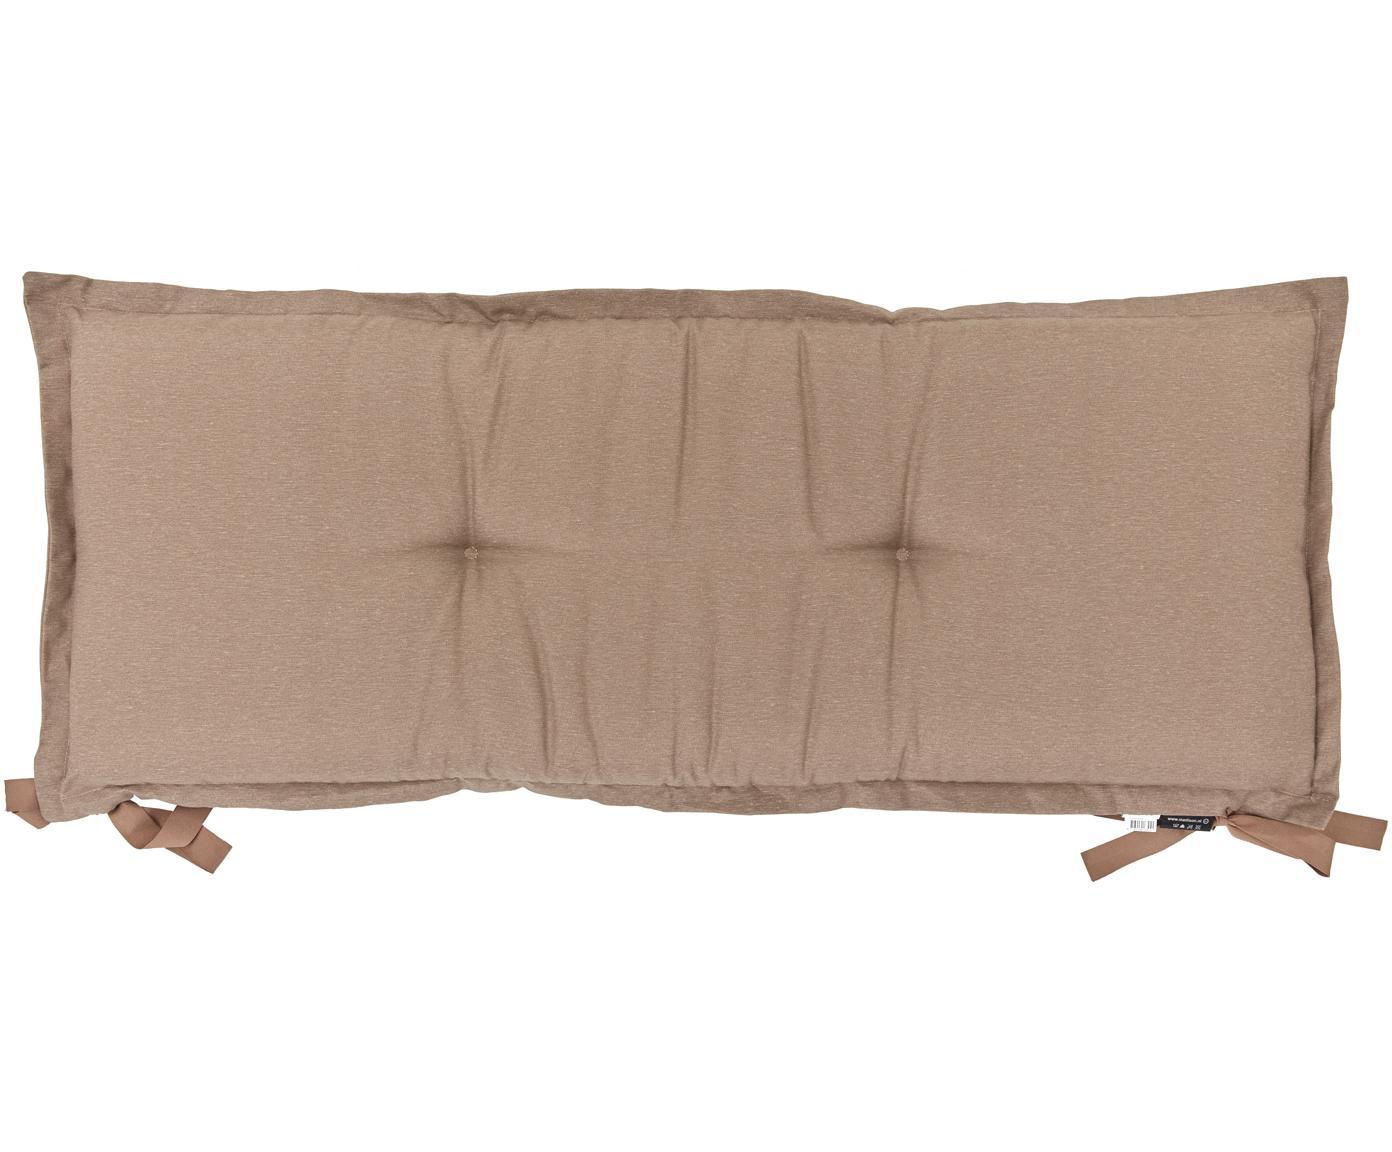 Einfarbige Bankauflage Panama, Bezug: 50% Baumwolle, 45% Polyes, Taupe, 48 x 120 cm